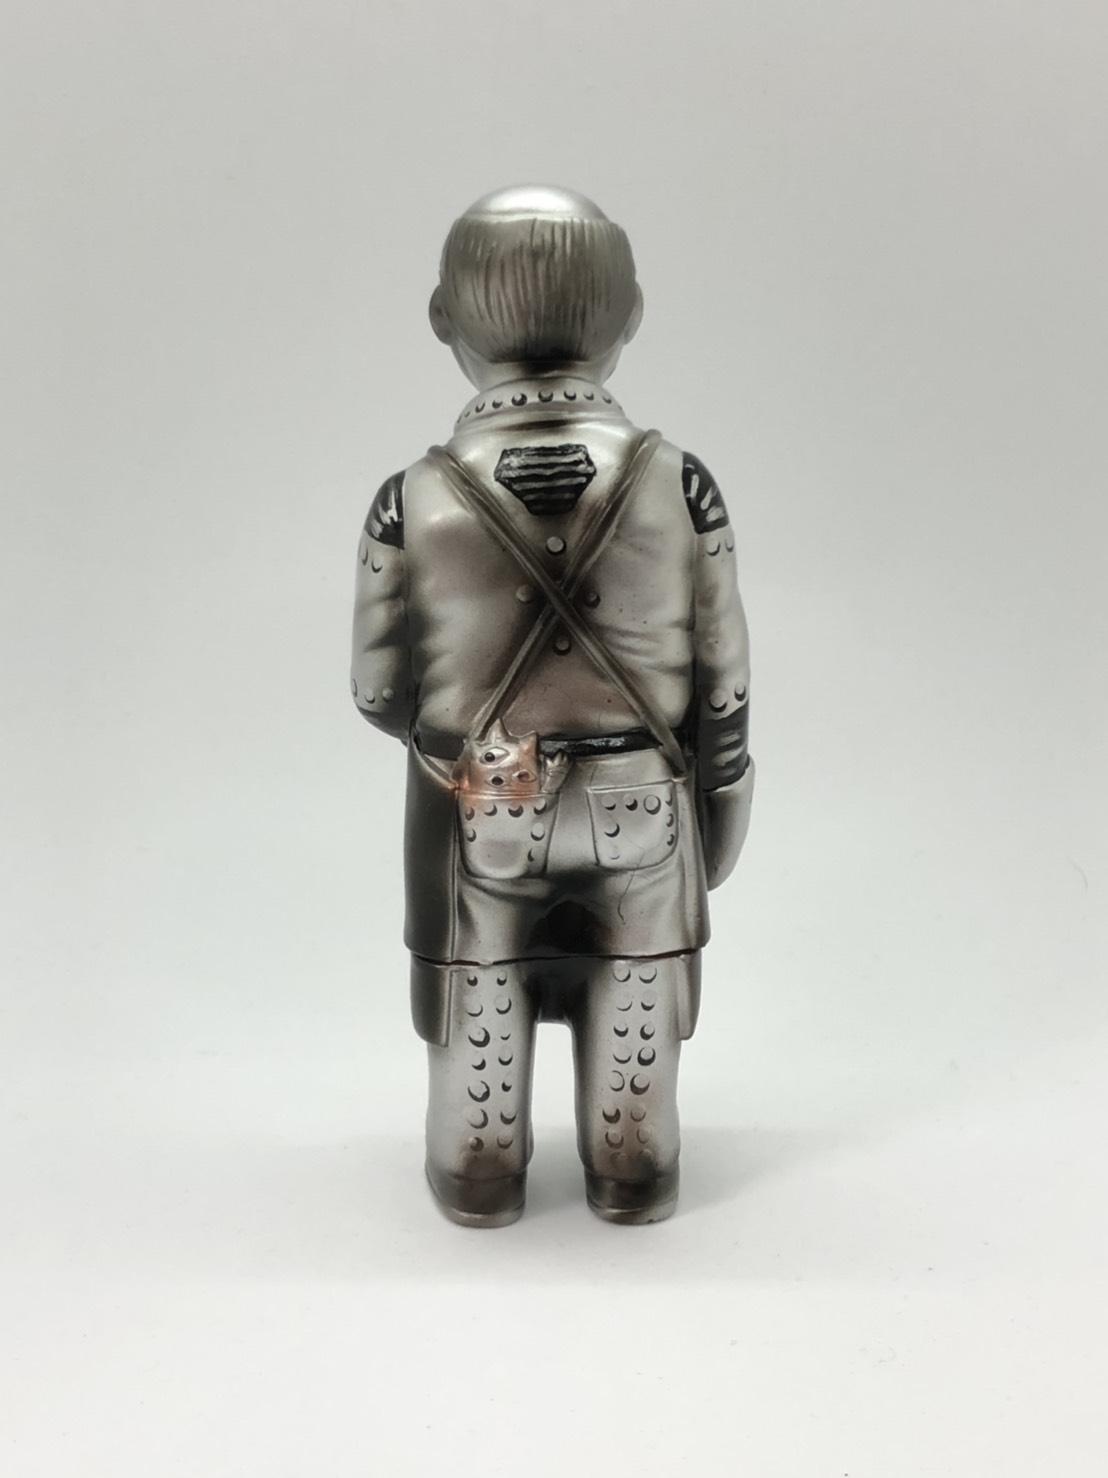 Sofubi-man Custom Show Blobpus robot sofubi man